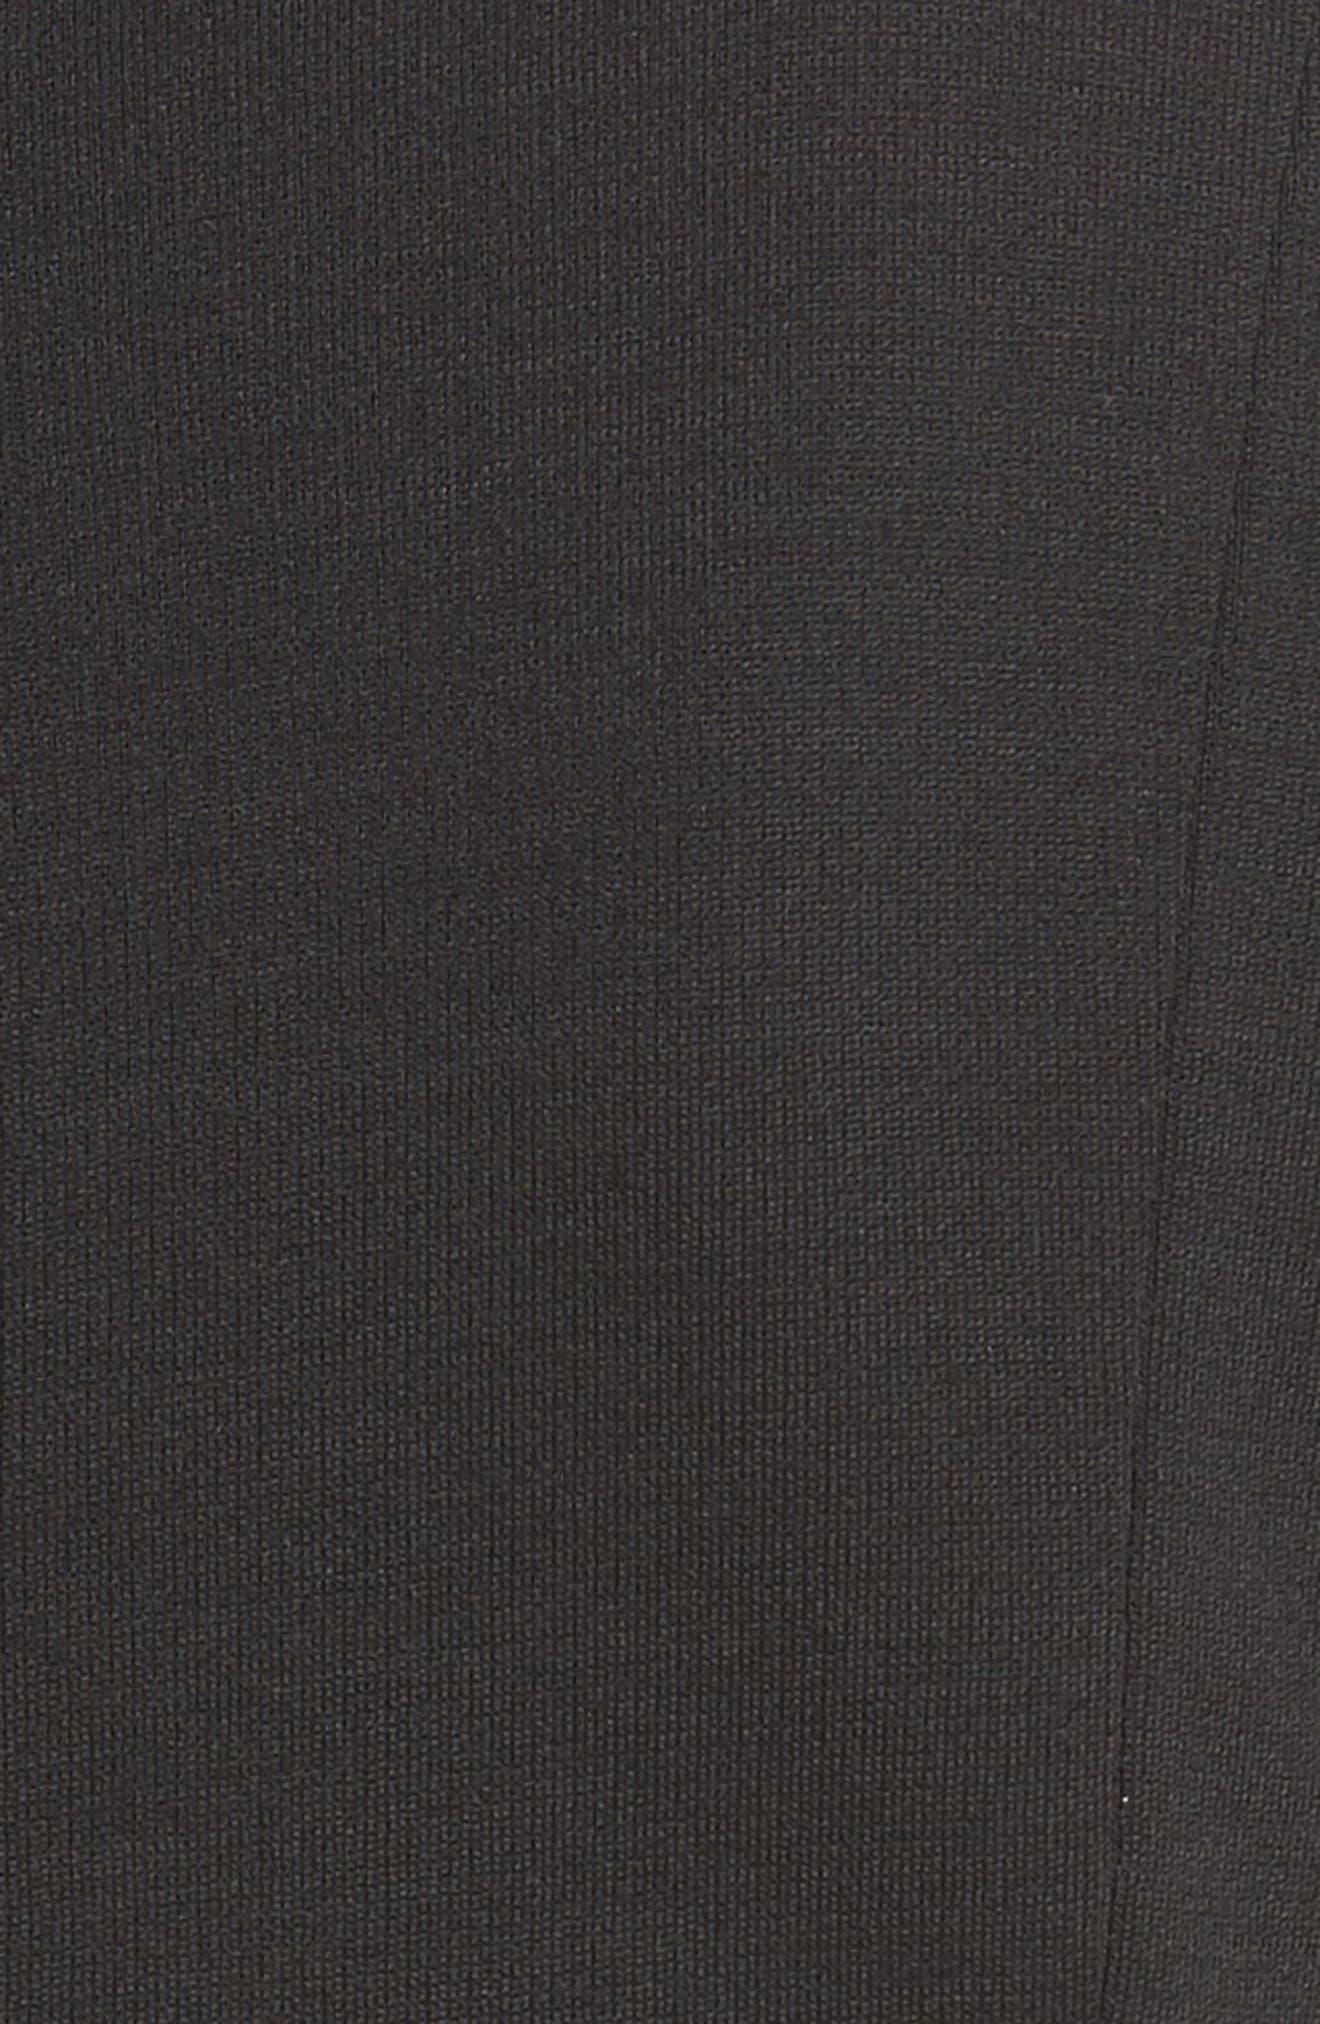 Lace-Up Milano Knit Dress,                             Alternate thumbnail 5, color,                             001